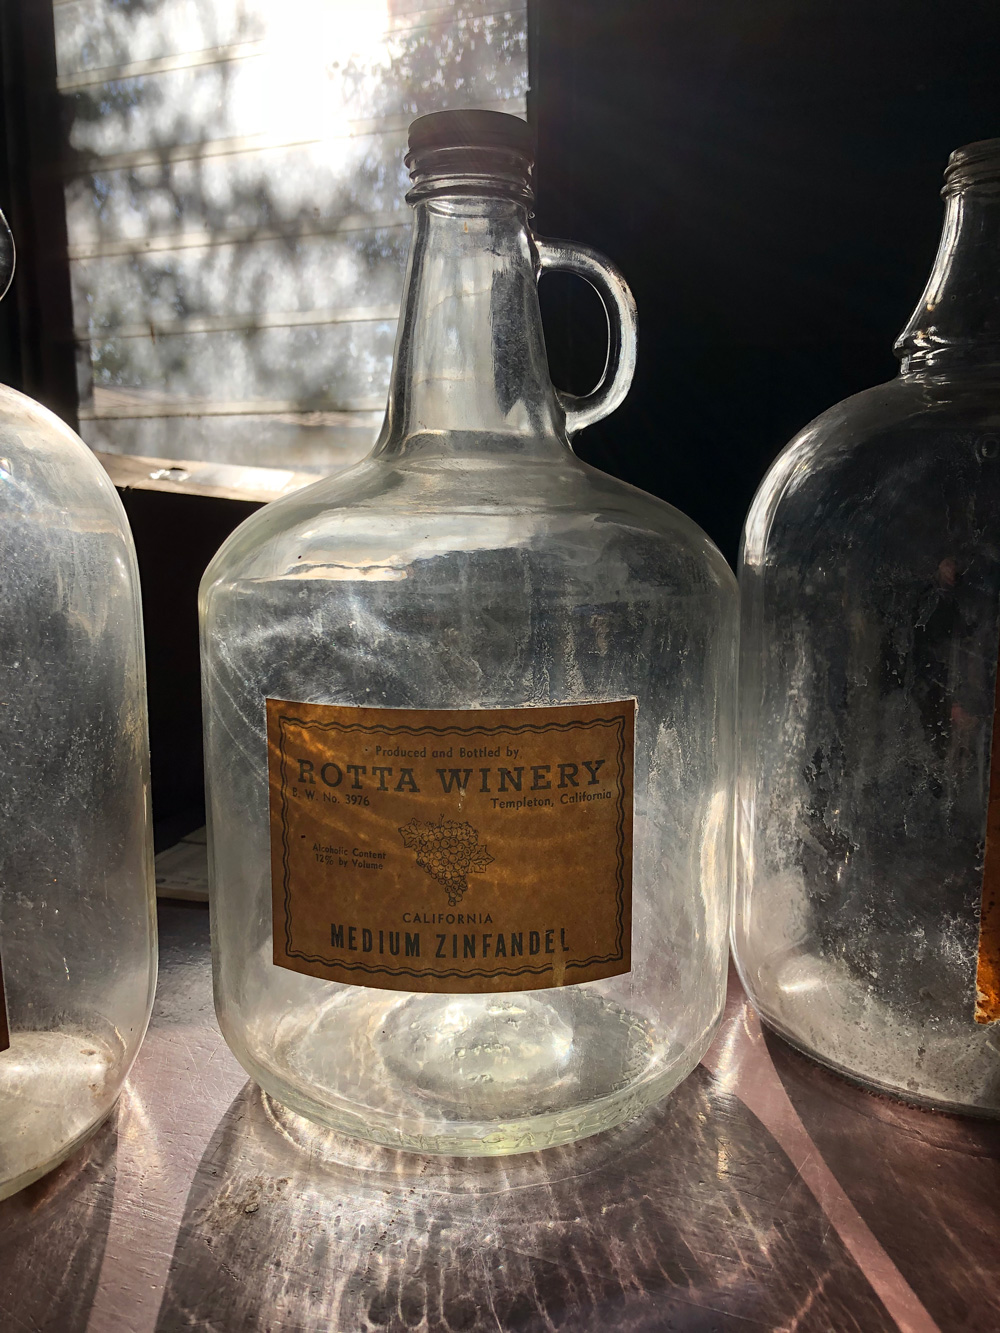 Rotta Wine Bottle